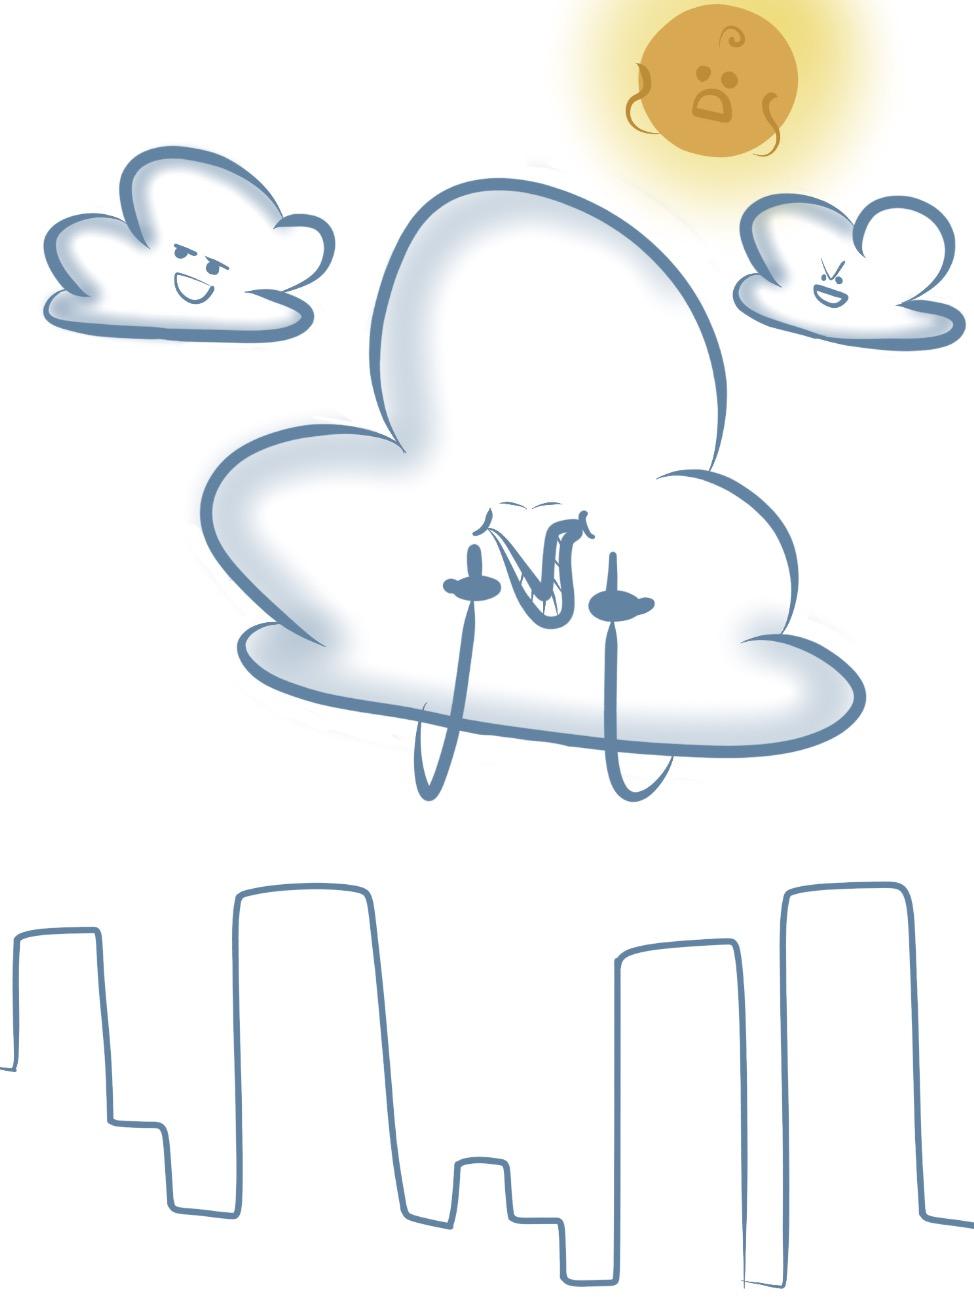 it's getting pretty cloudy